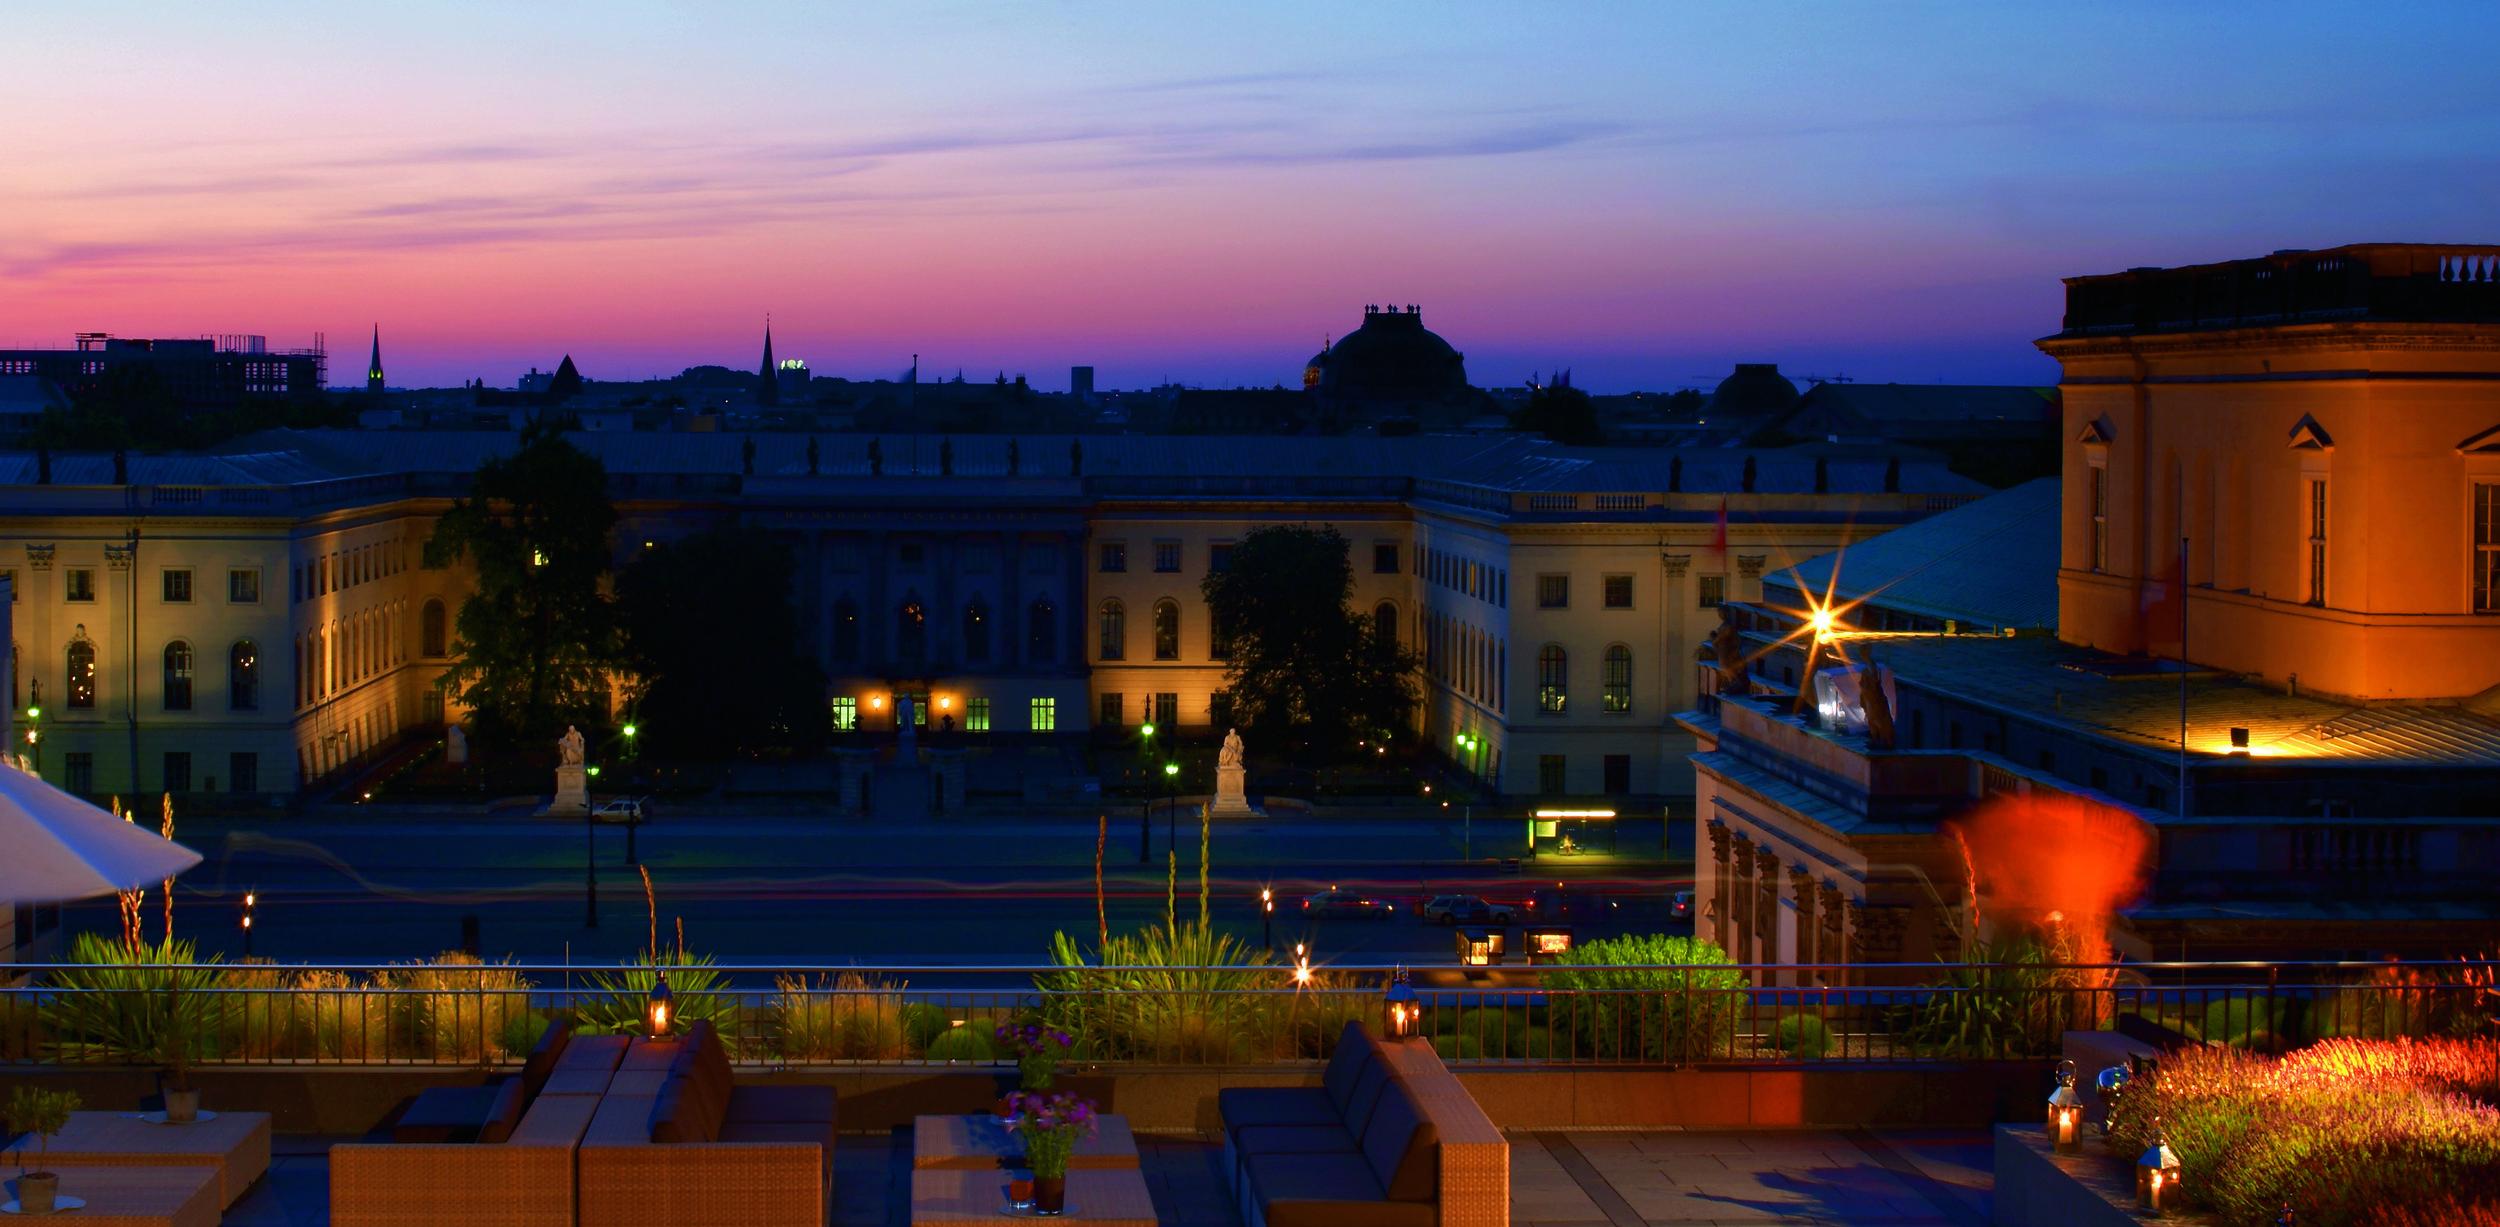 5a RFH Hotel De Rome - Roof Terrace Oct 08 AH.jpg